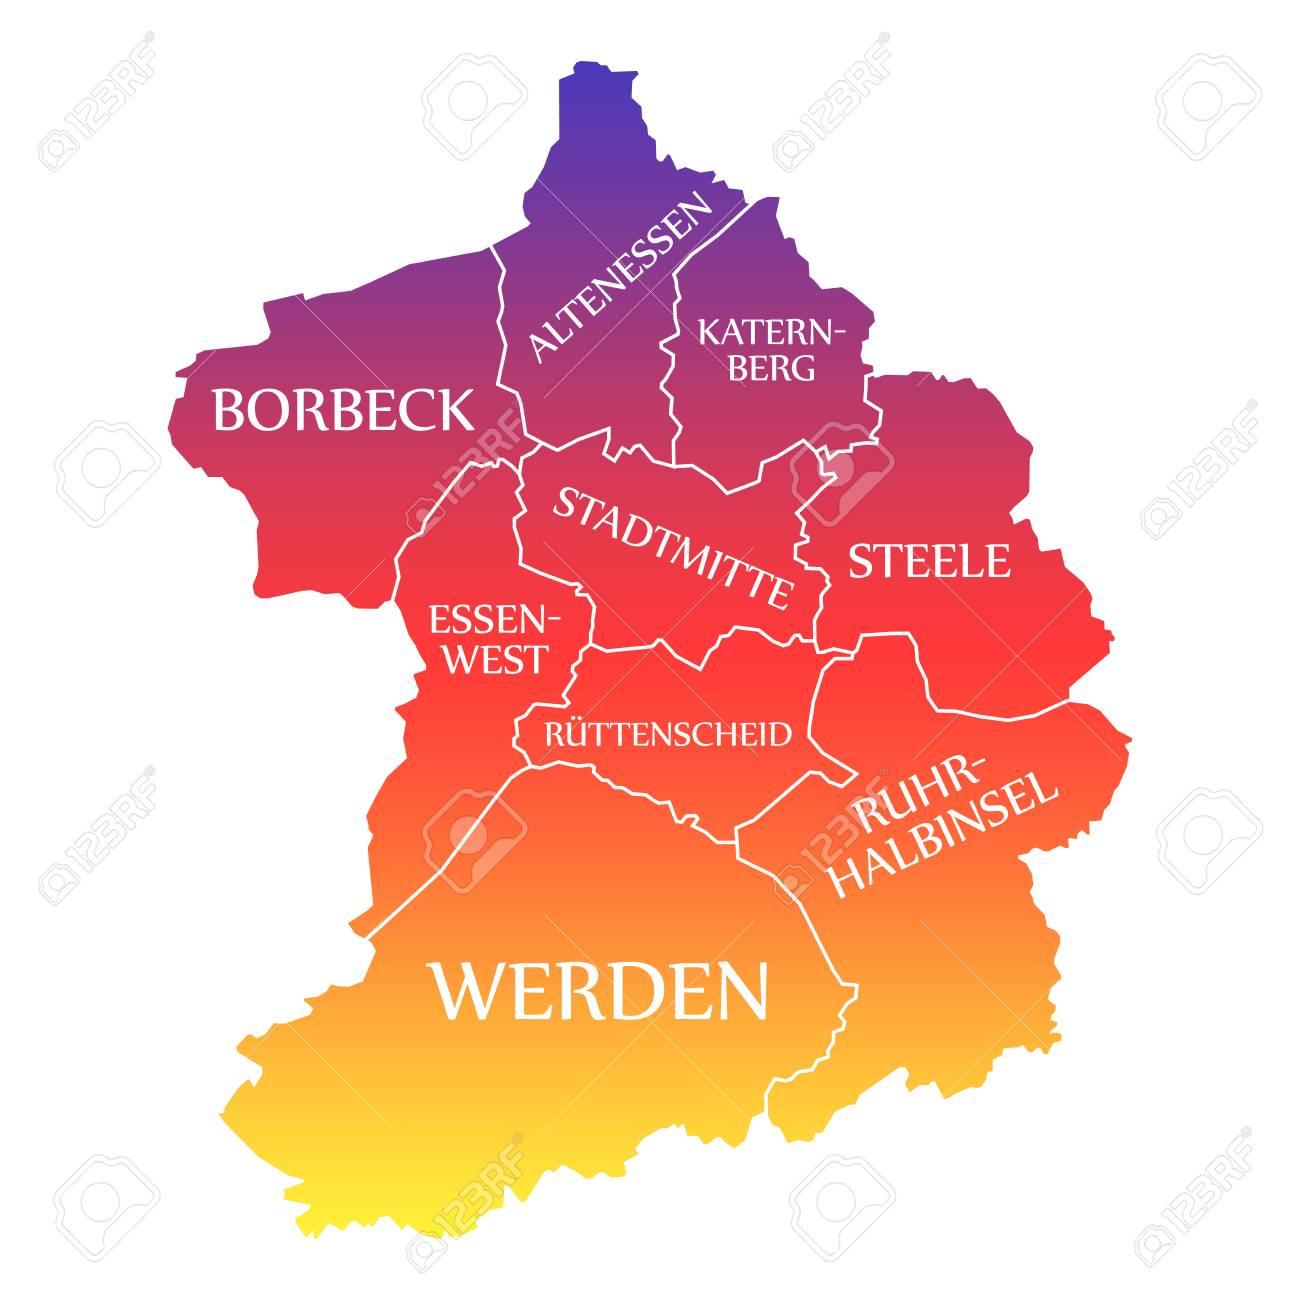 Map Of Germany Essen.Stock Illustration